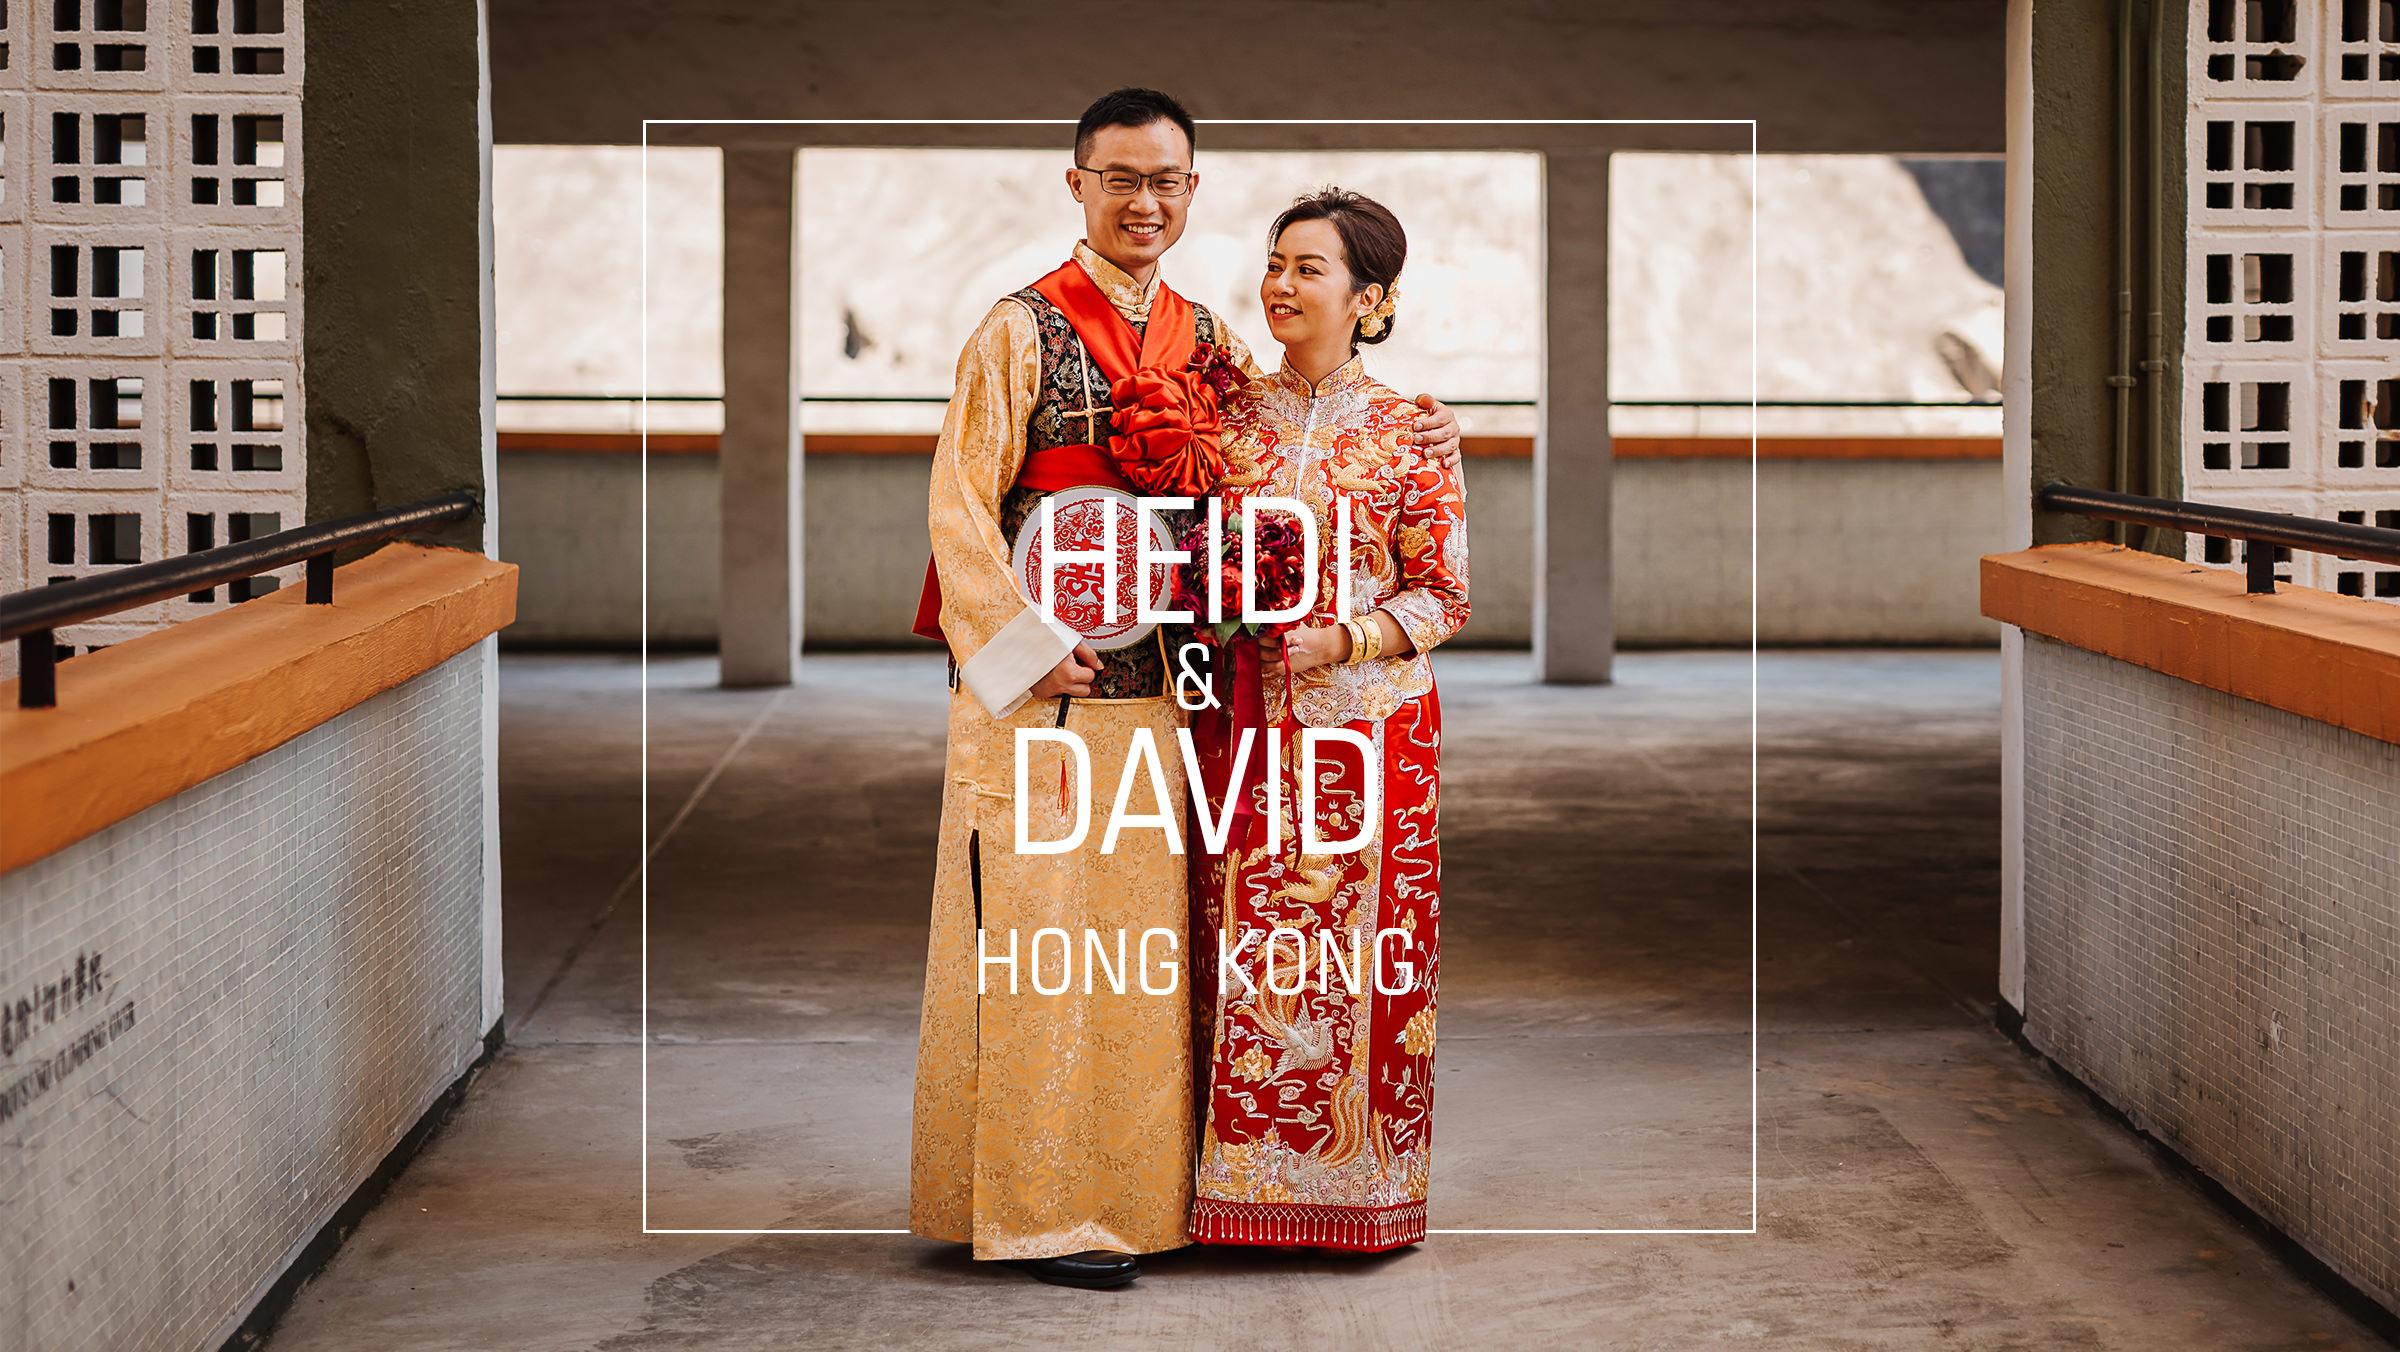 Heidi and David.jpg